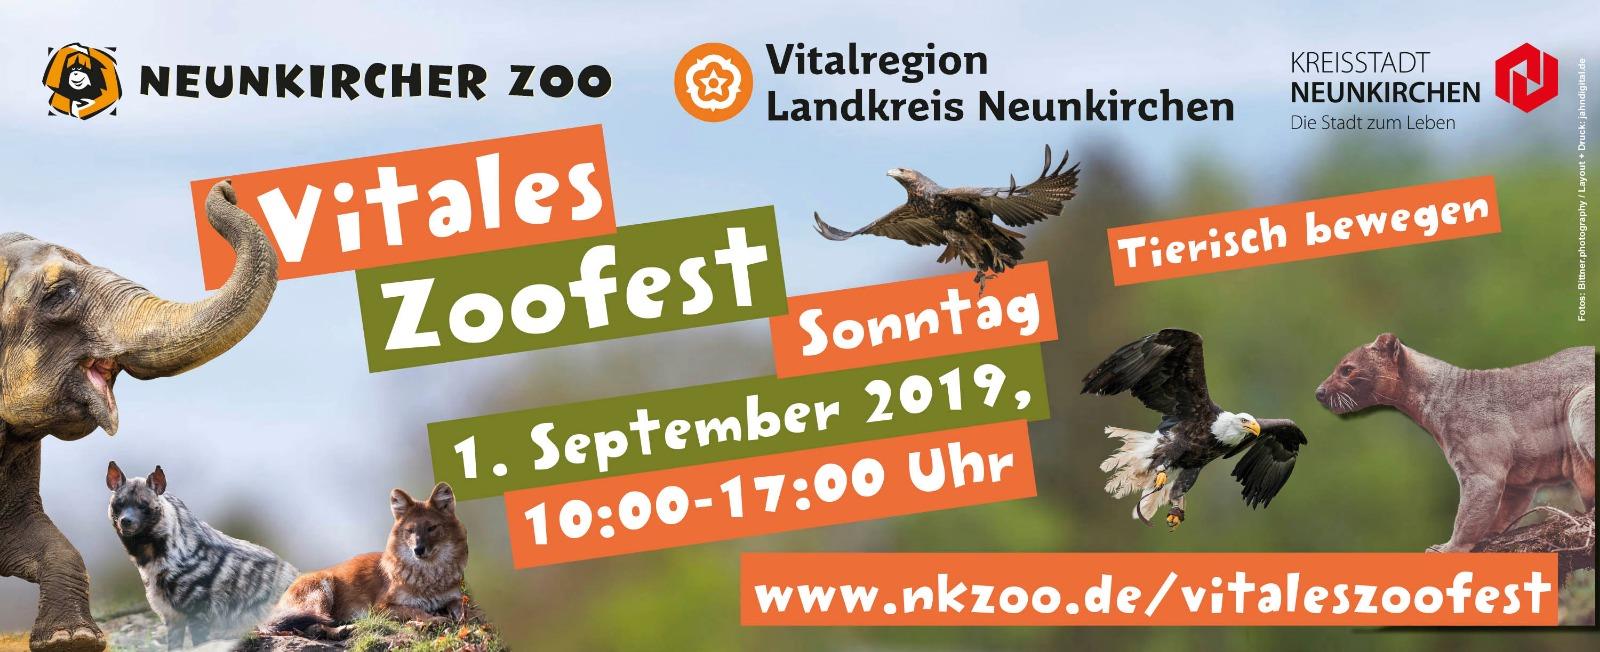 Vitales Zoofest